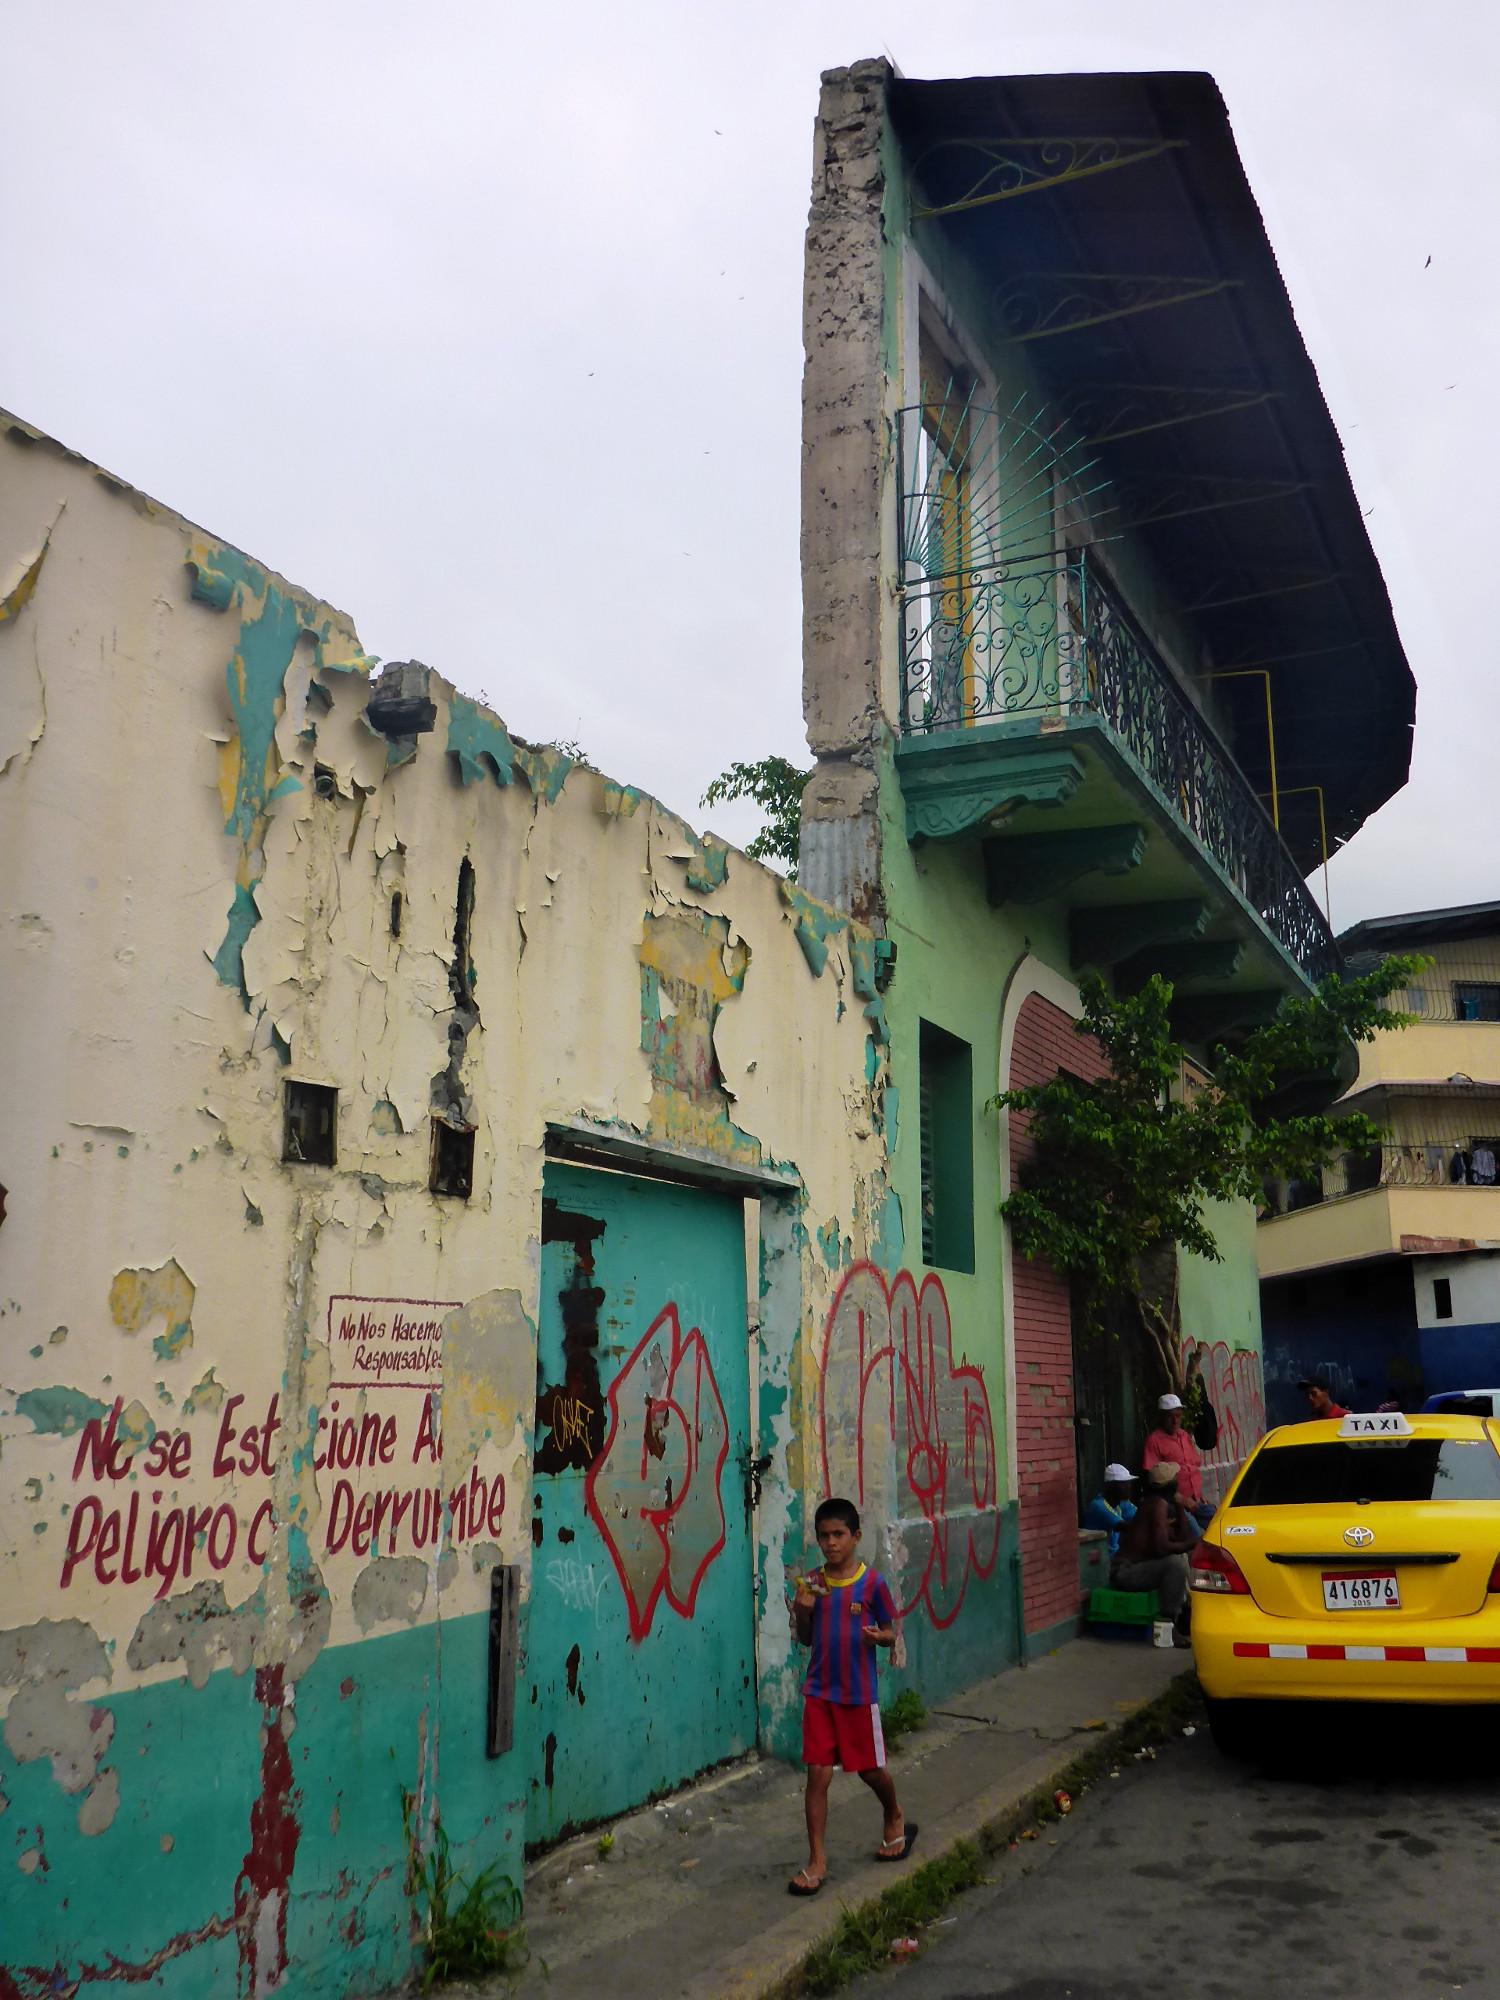 Fassade im Casco Viejo, der Altstadt von Panama City   Façade in Casco Viejo, the historical center of Panama City